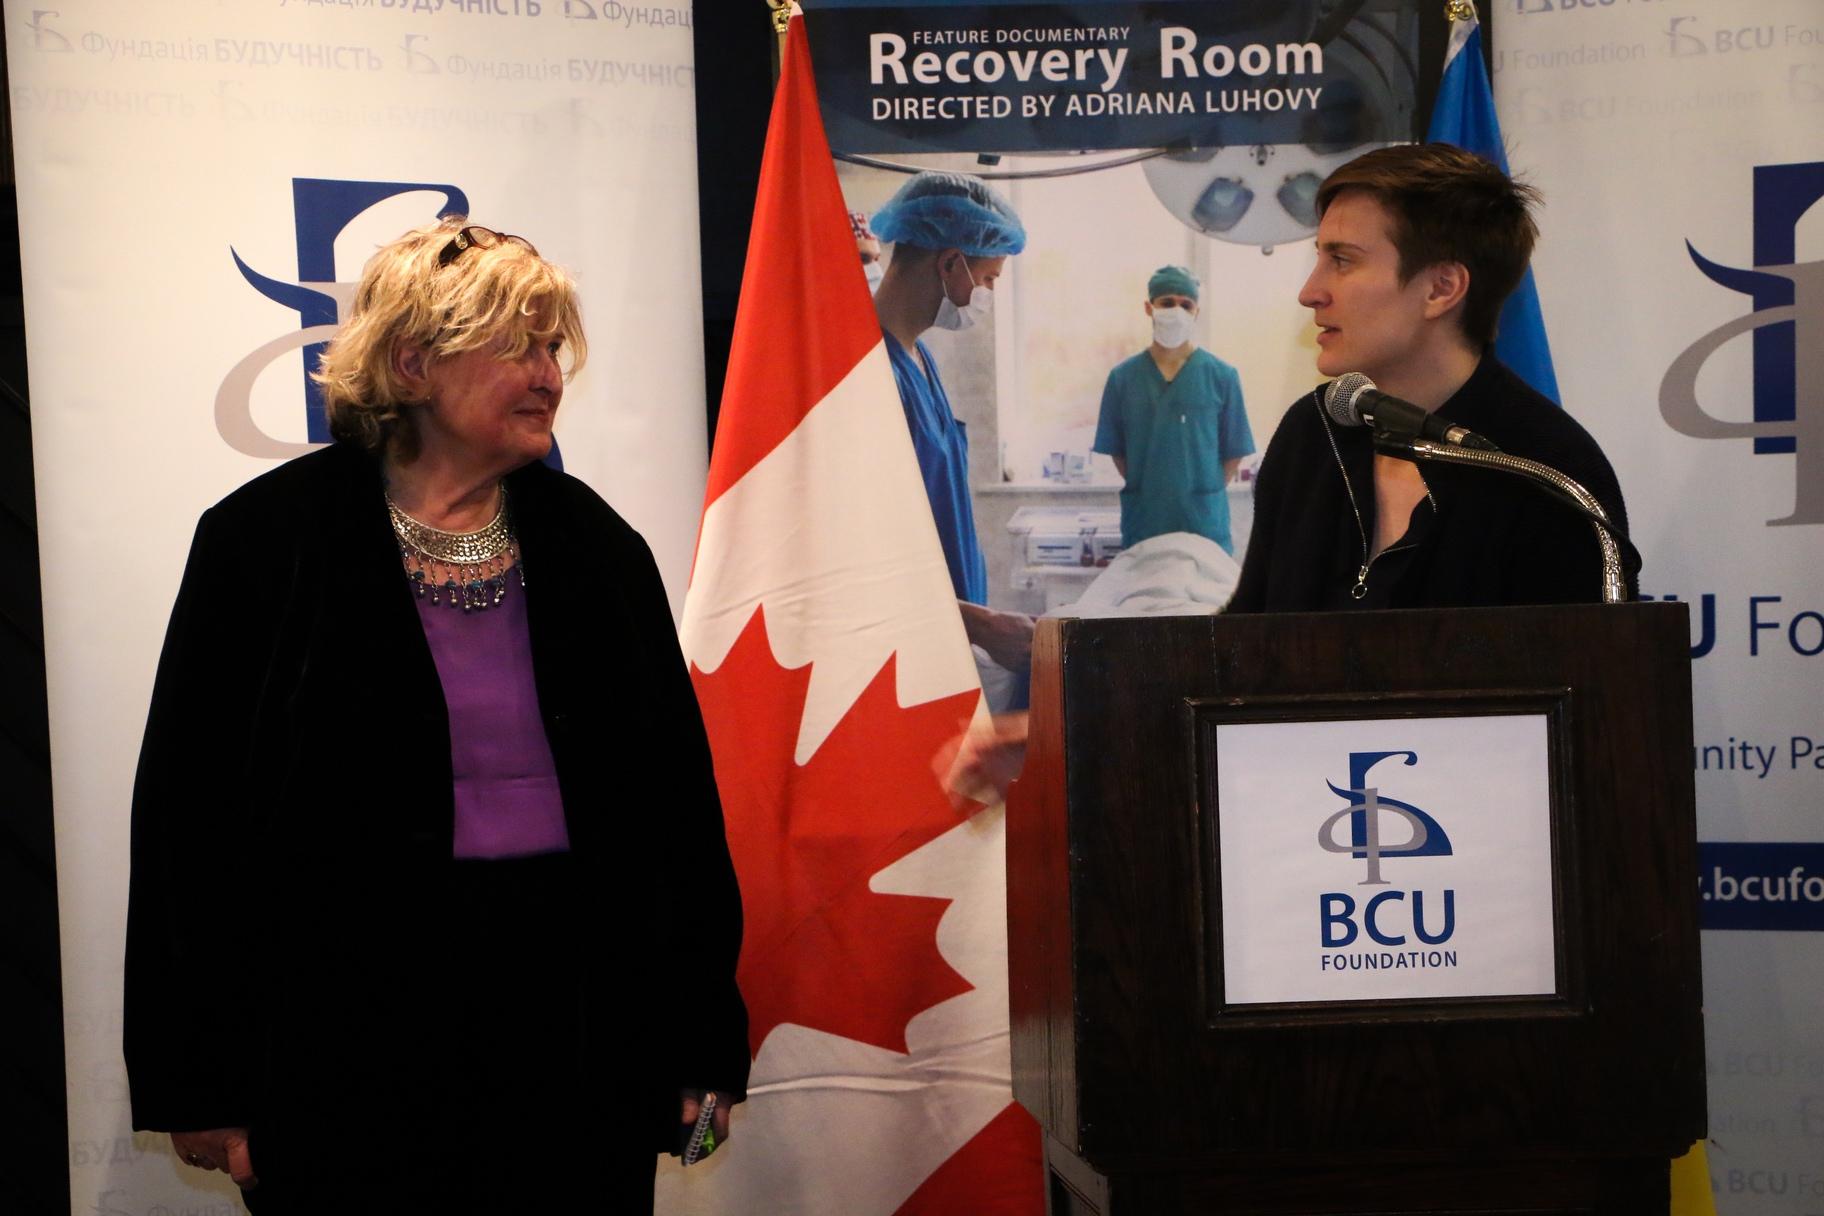 Adriana Luhovy Screening Recovery Room (BCU Toronto)